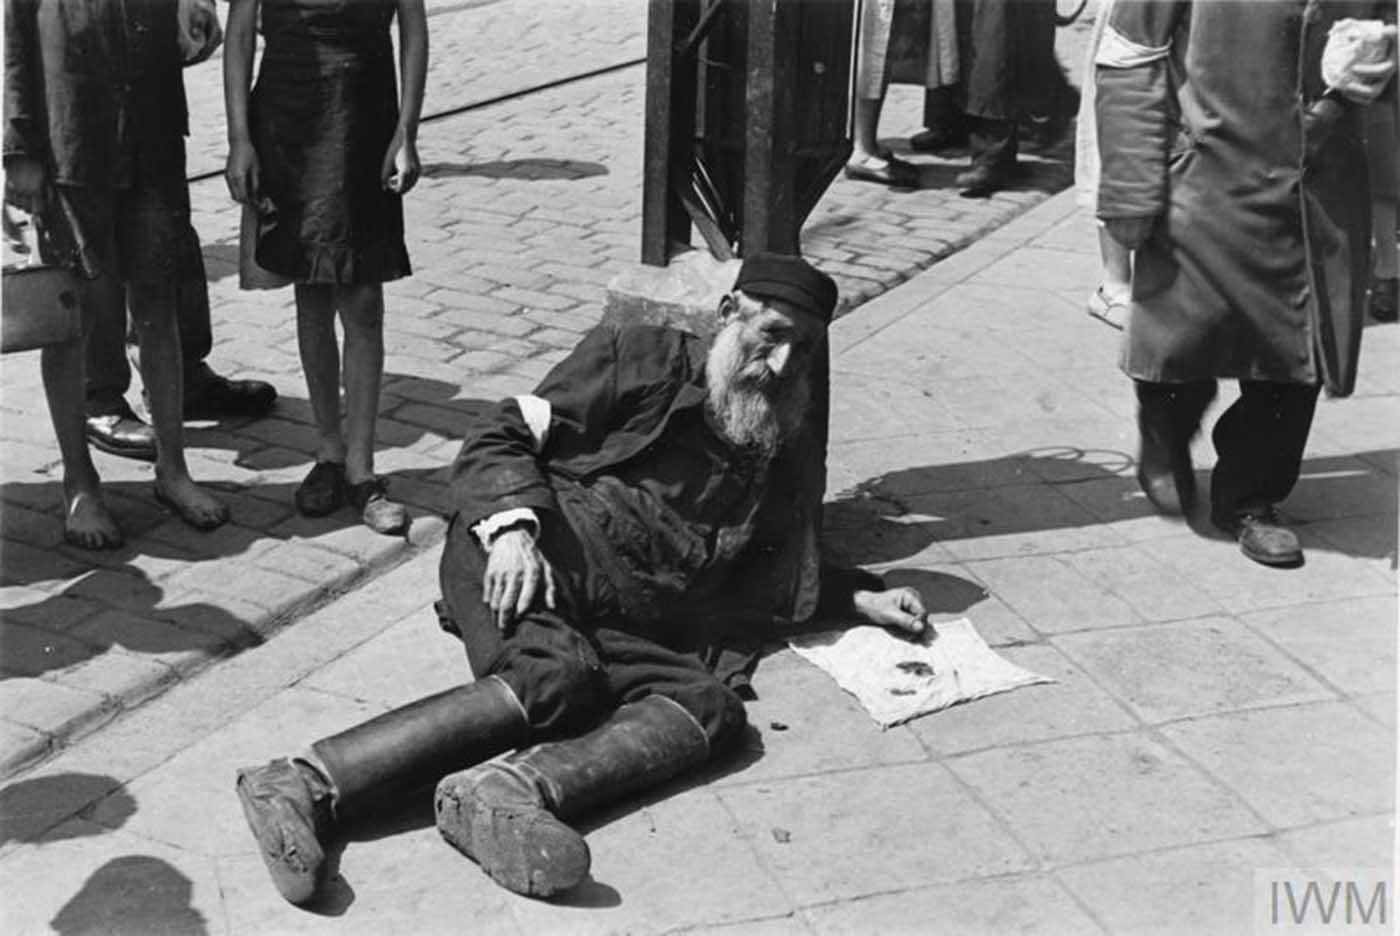 An elderly man lying on the pavement